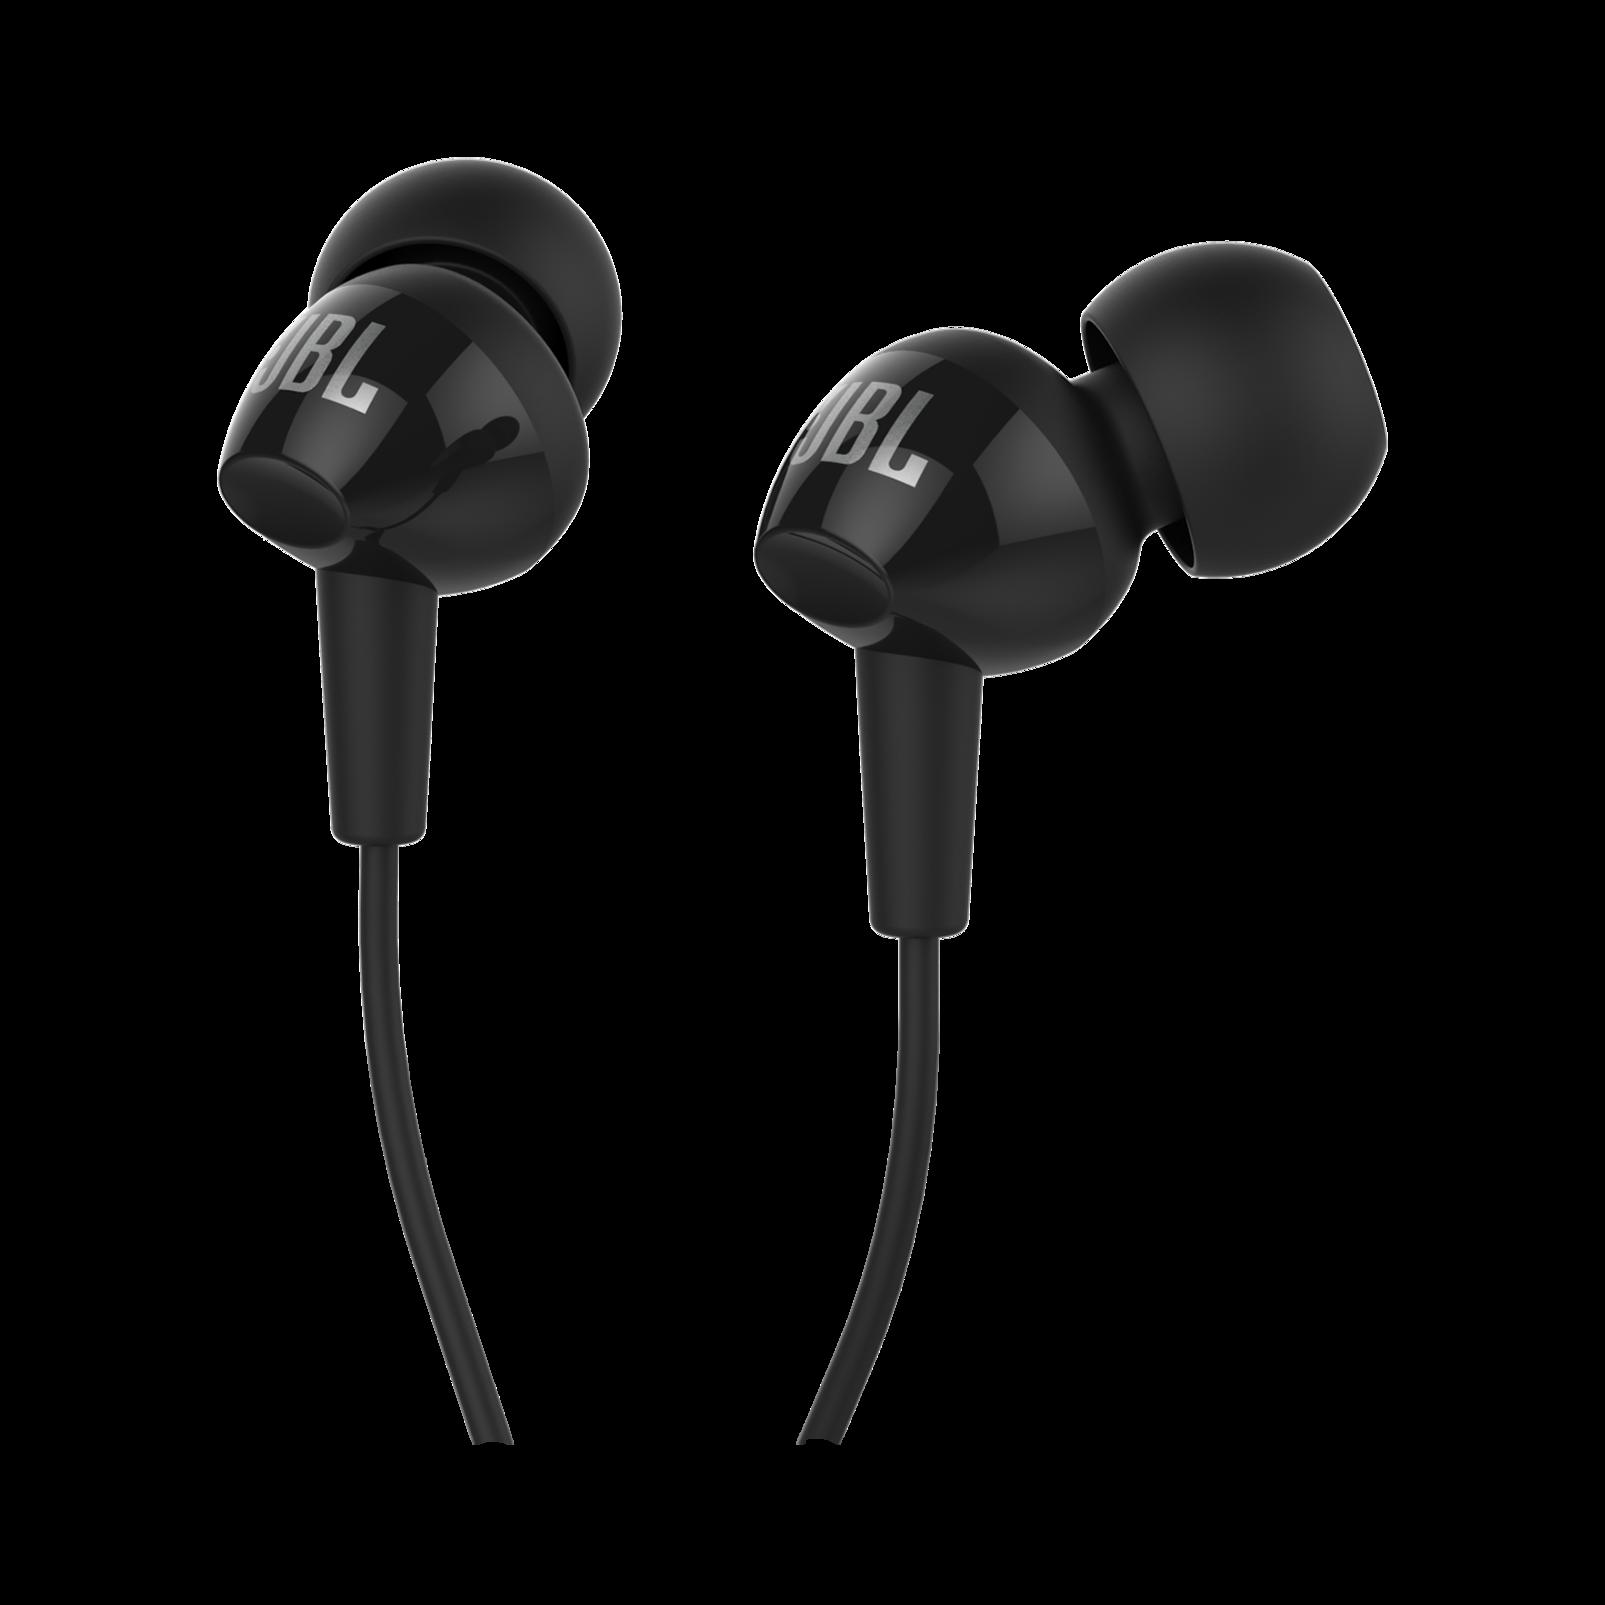 c100si in ear headphones. Black Bedroom Furniture Sets. Home Design Ideas